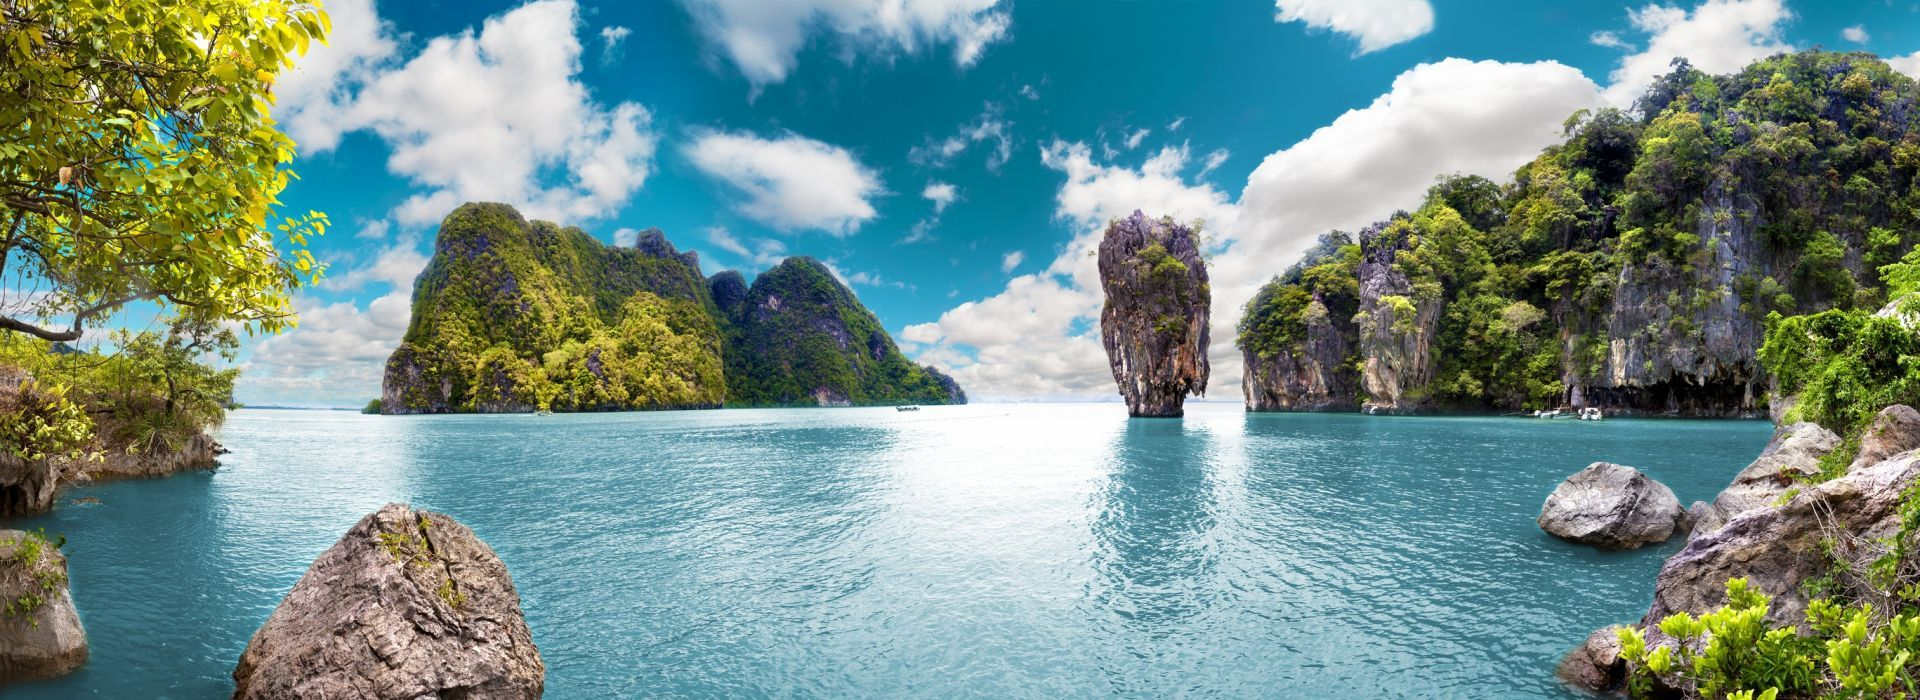 Local boat rides Tours in Bangkok